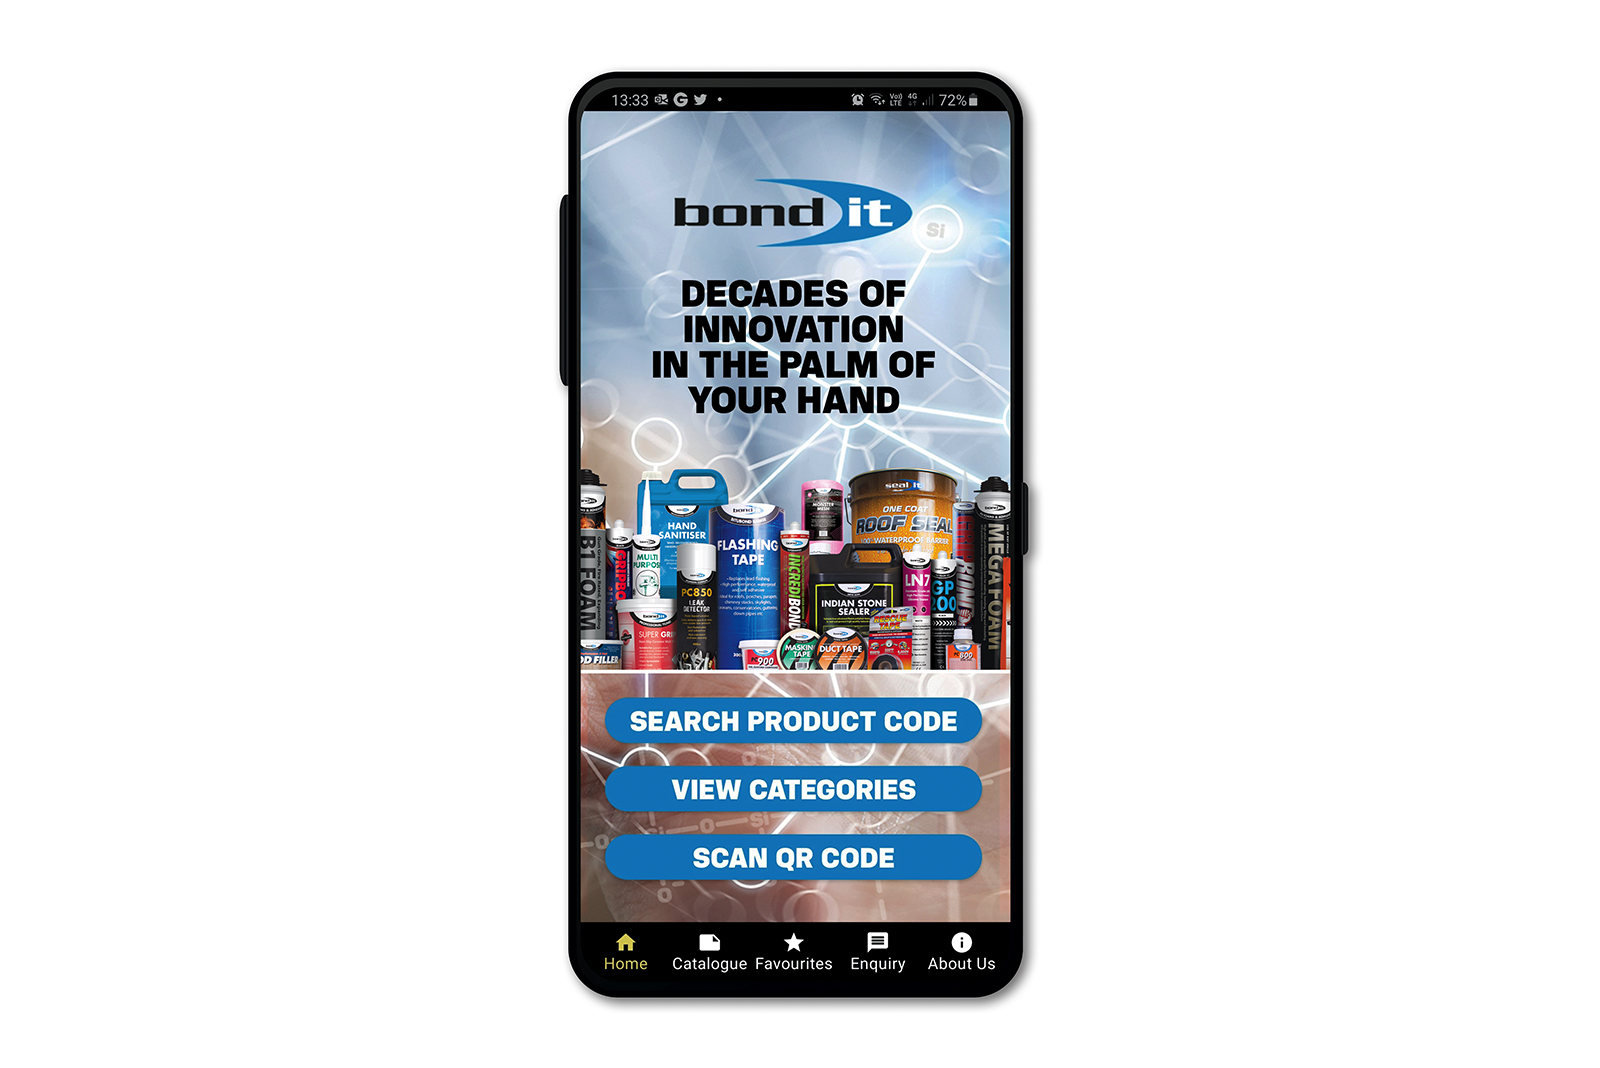 Bond It launches new app